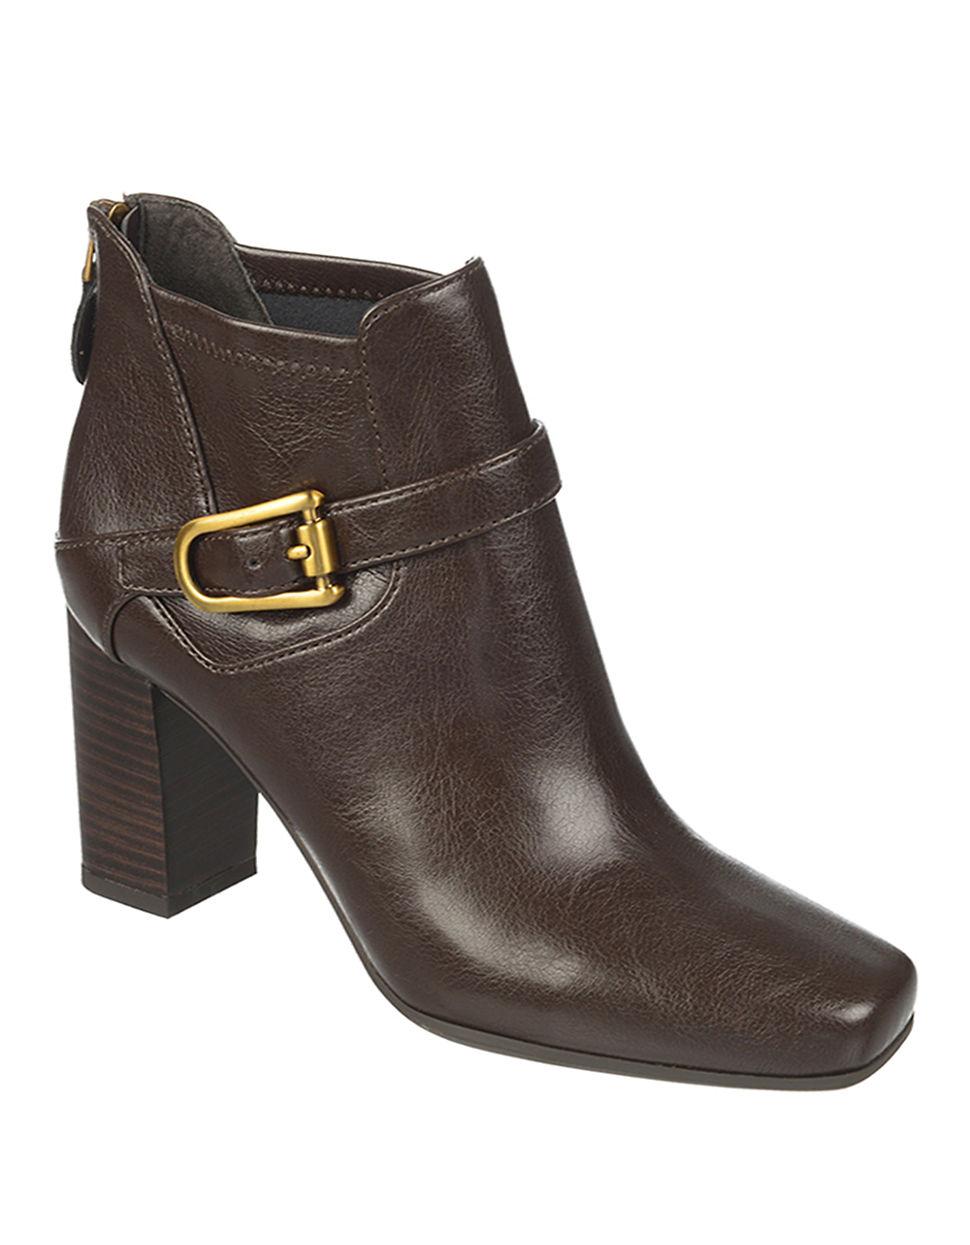 franco sarto zengo high heel boots in brown brown leather